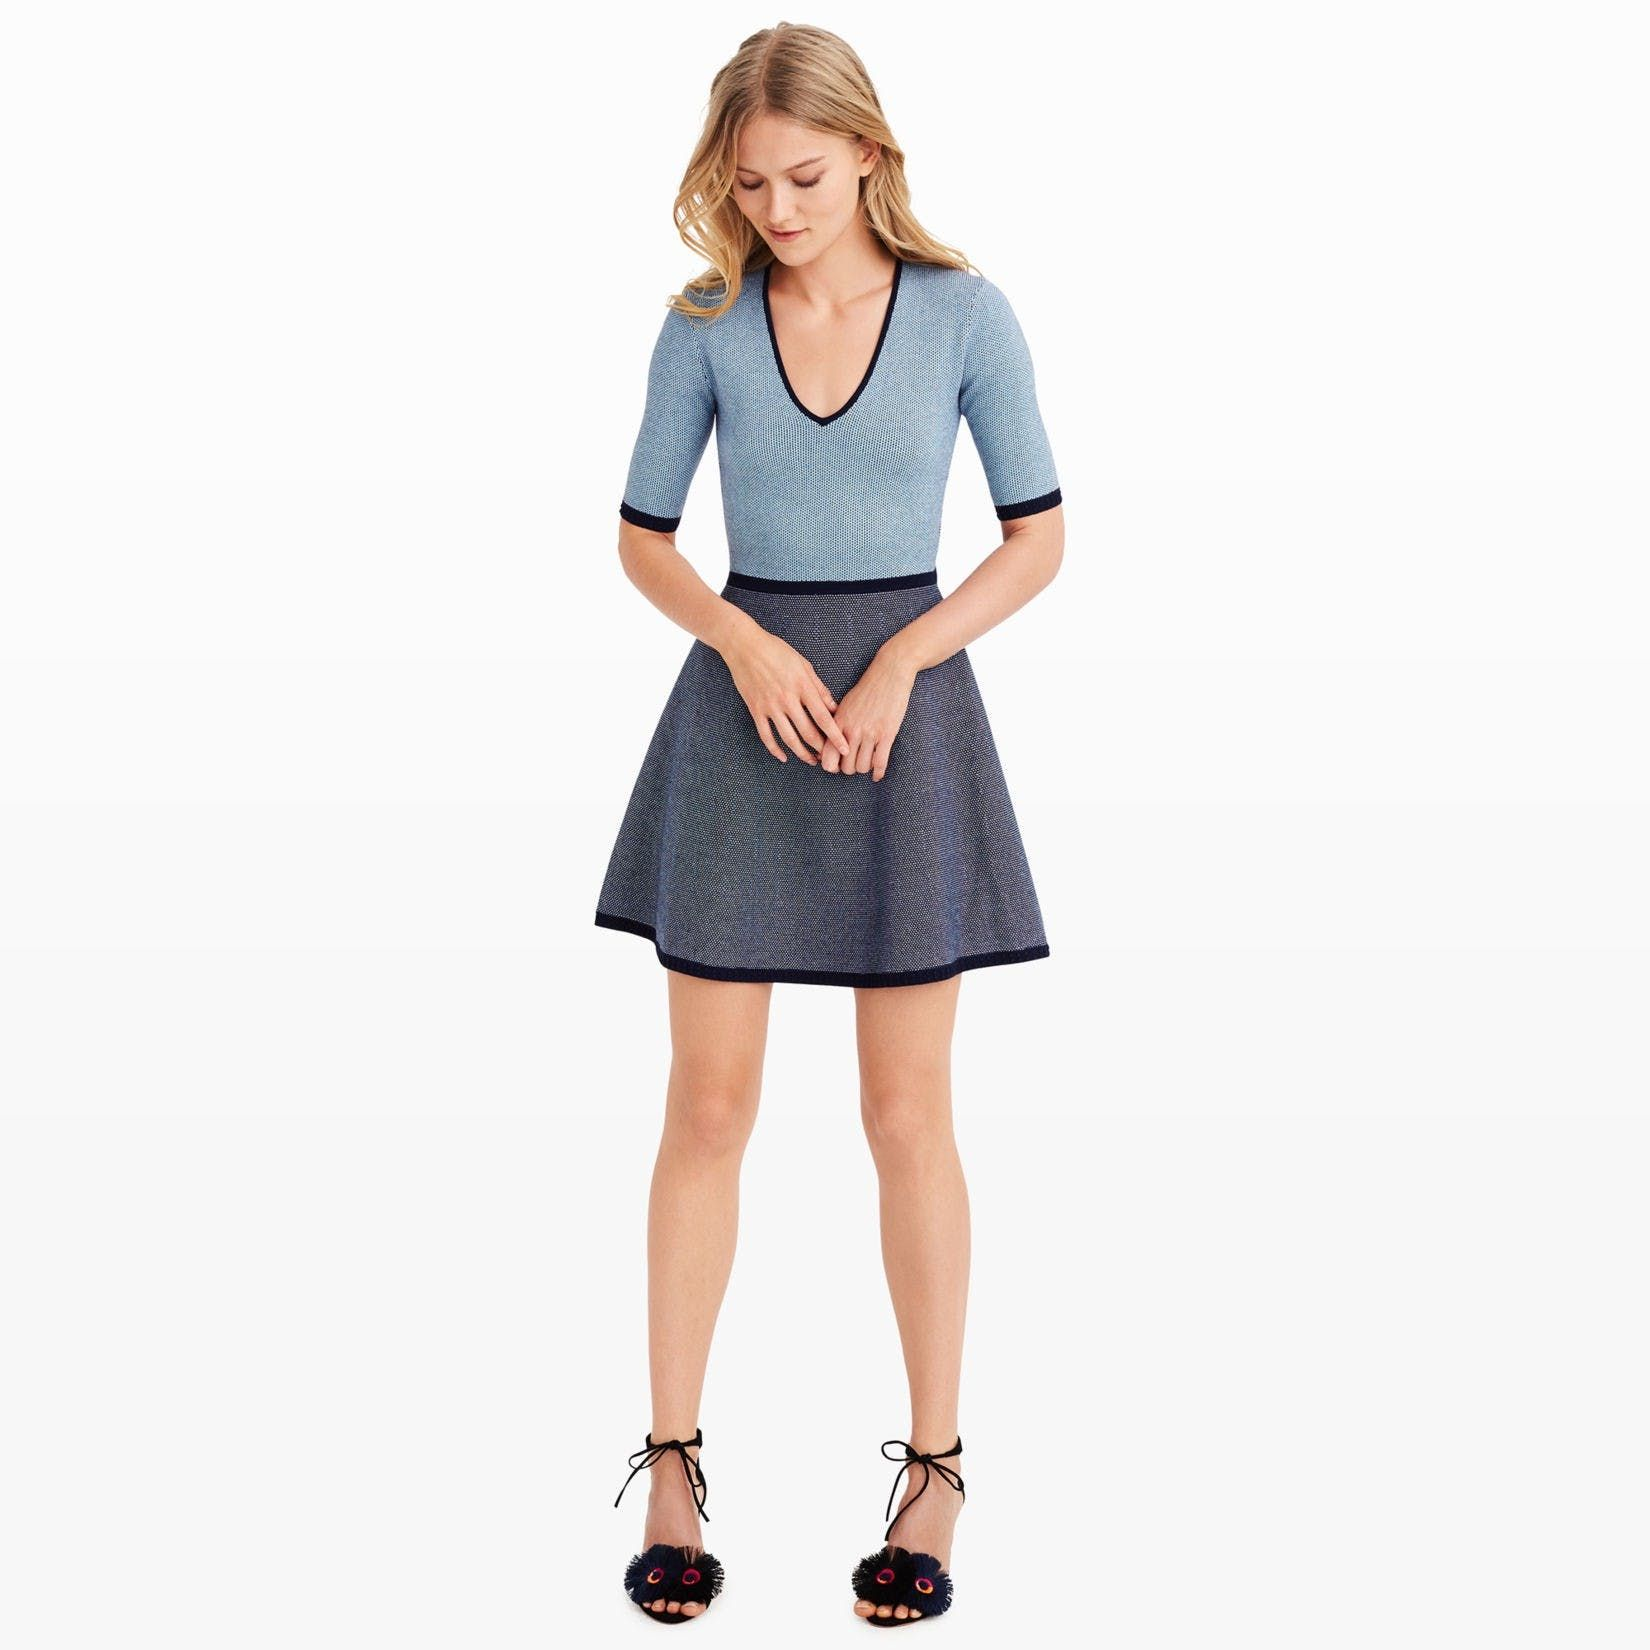 6b4c98ddf1f Wisten Sweater Dress by Club Monaco